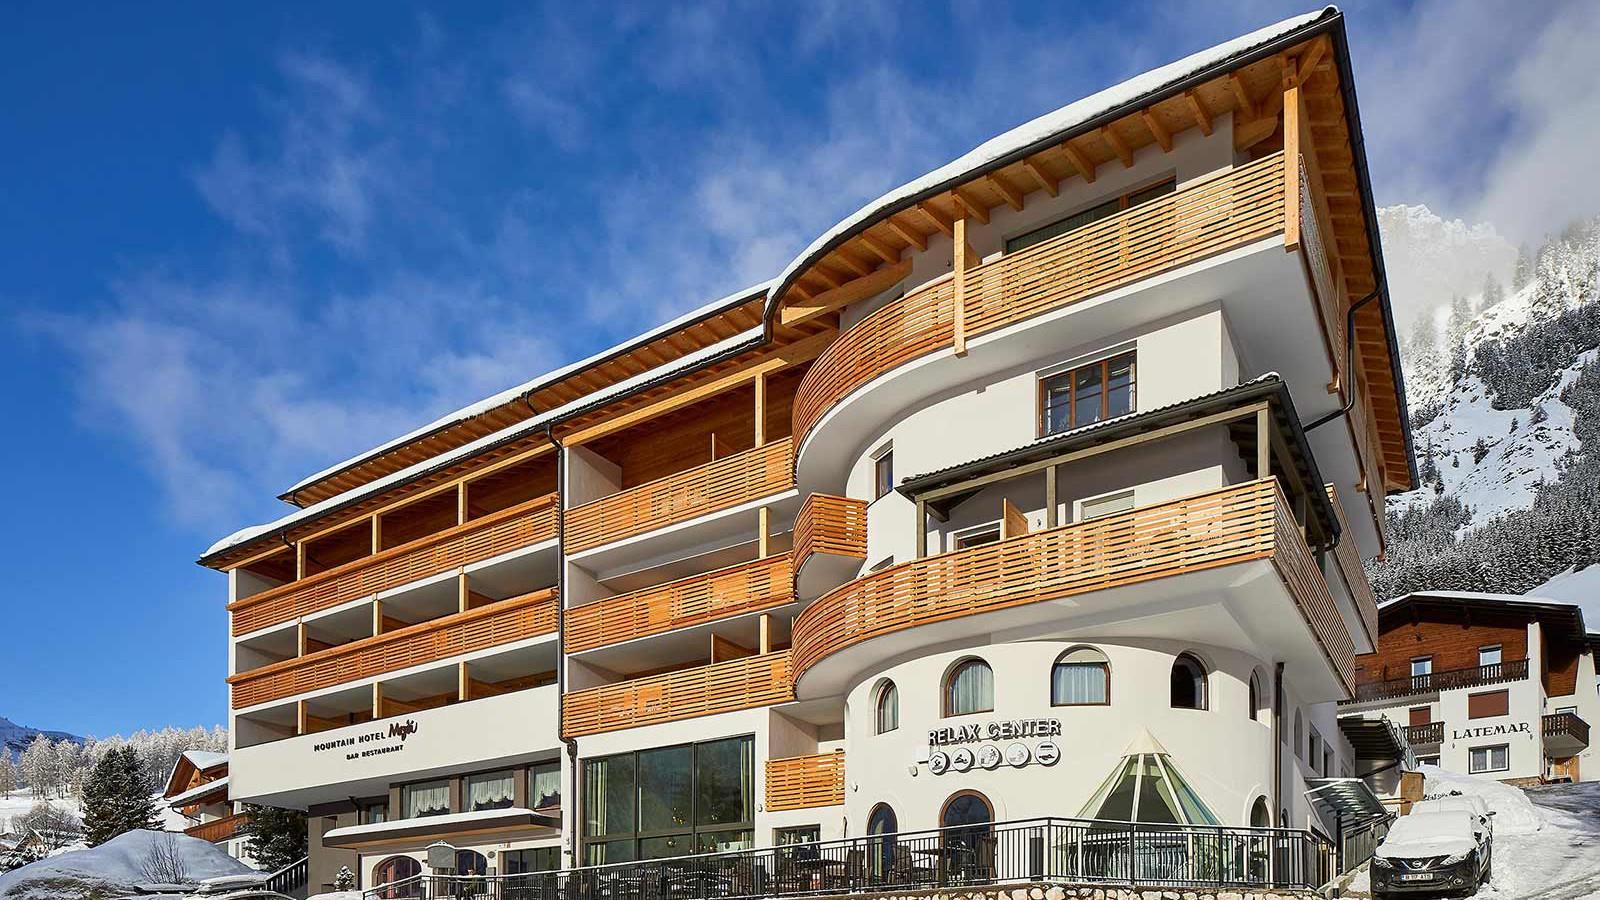 Hotel Mezdi, Corvara and Colfosco - Exterior